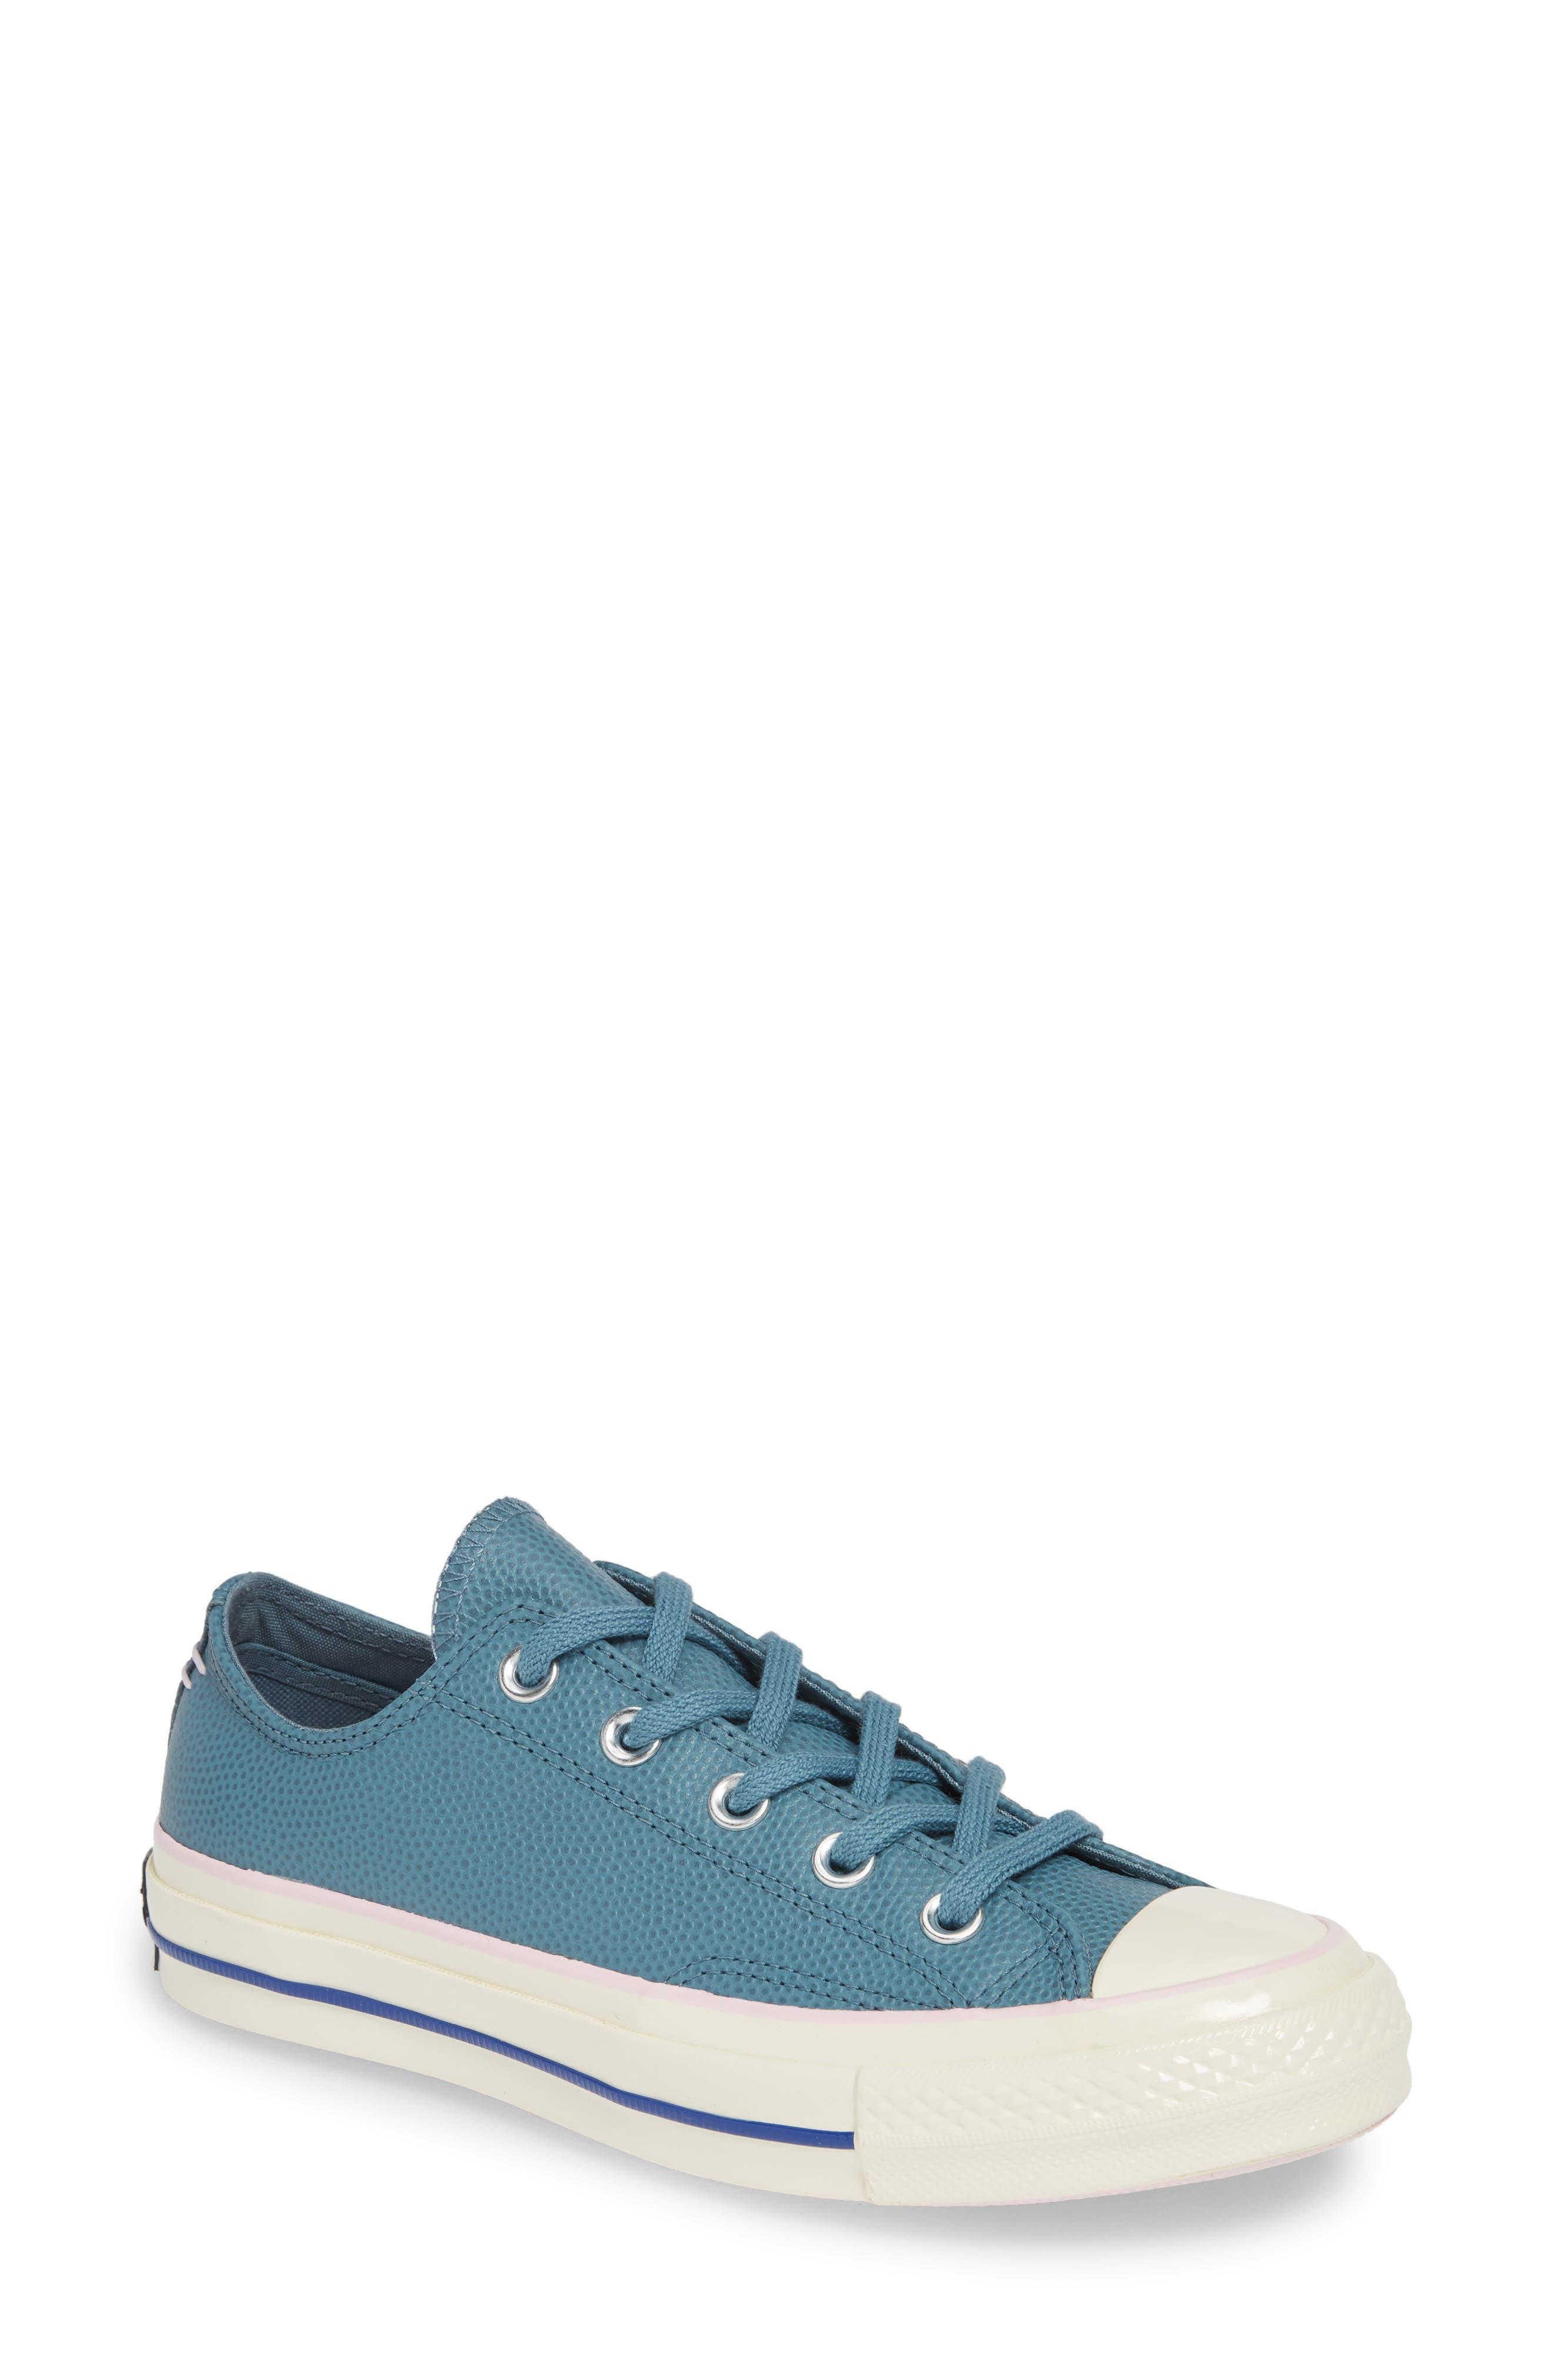 63c5474aea40d6 Converse Chuck Taylor All Star Chuck 70 Ox Leather Sneaker